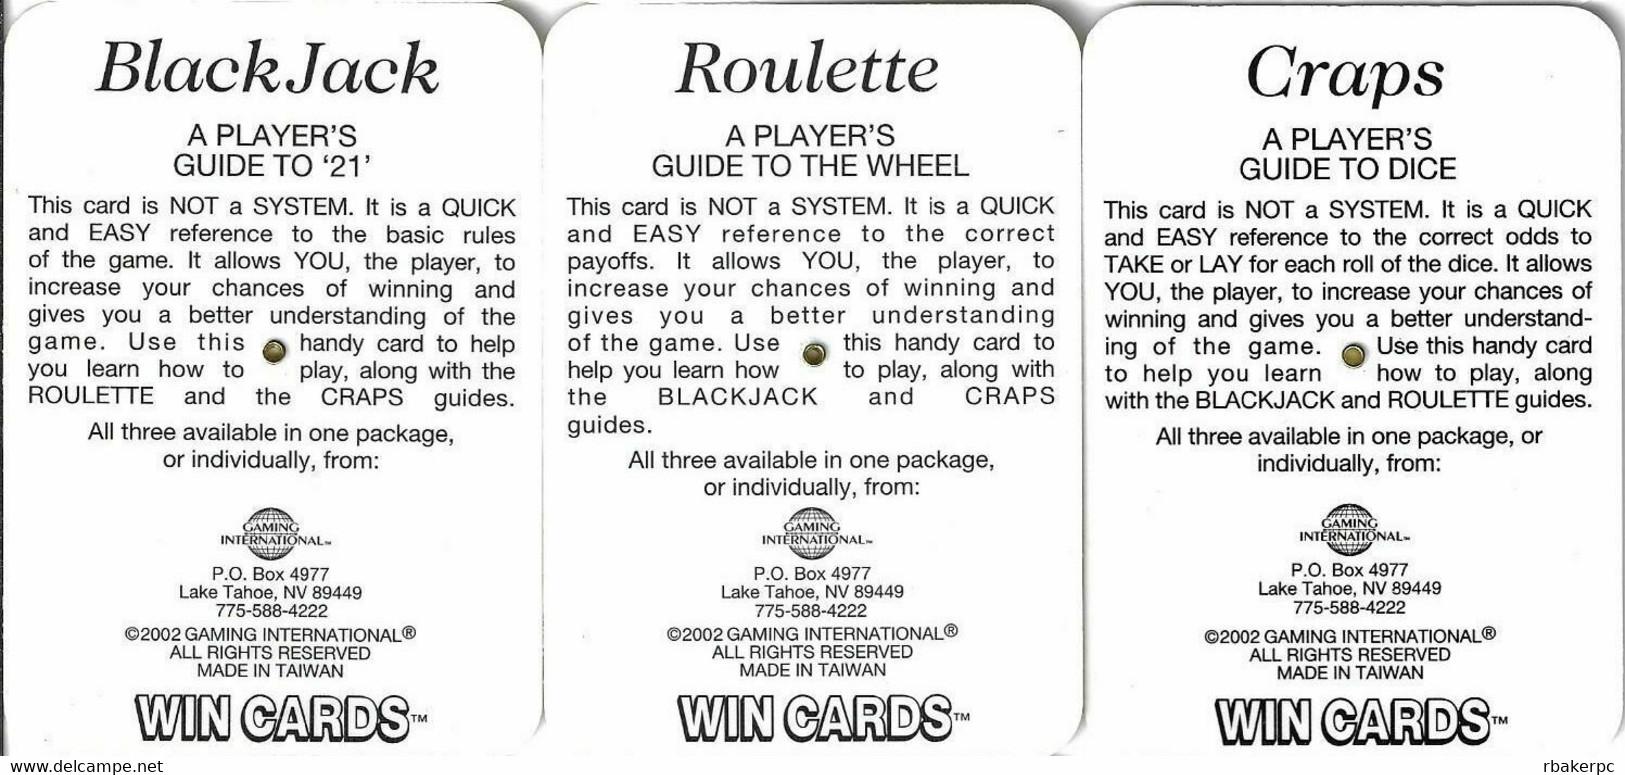 Set Of 3 Colorado Belle Casino WinCards (c) 2002 - Craps, Blackjack And Roulette - Casino Cards